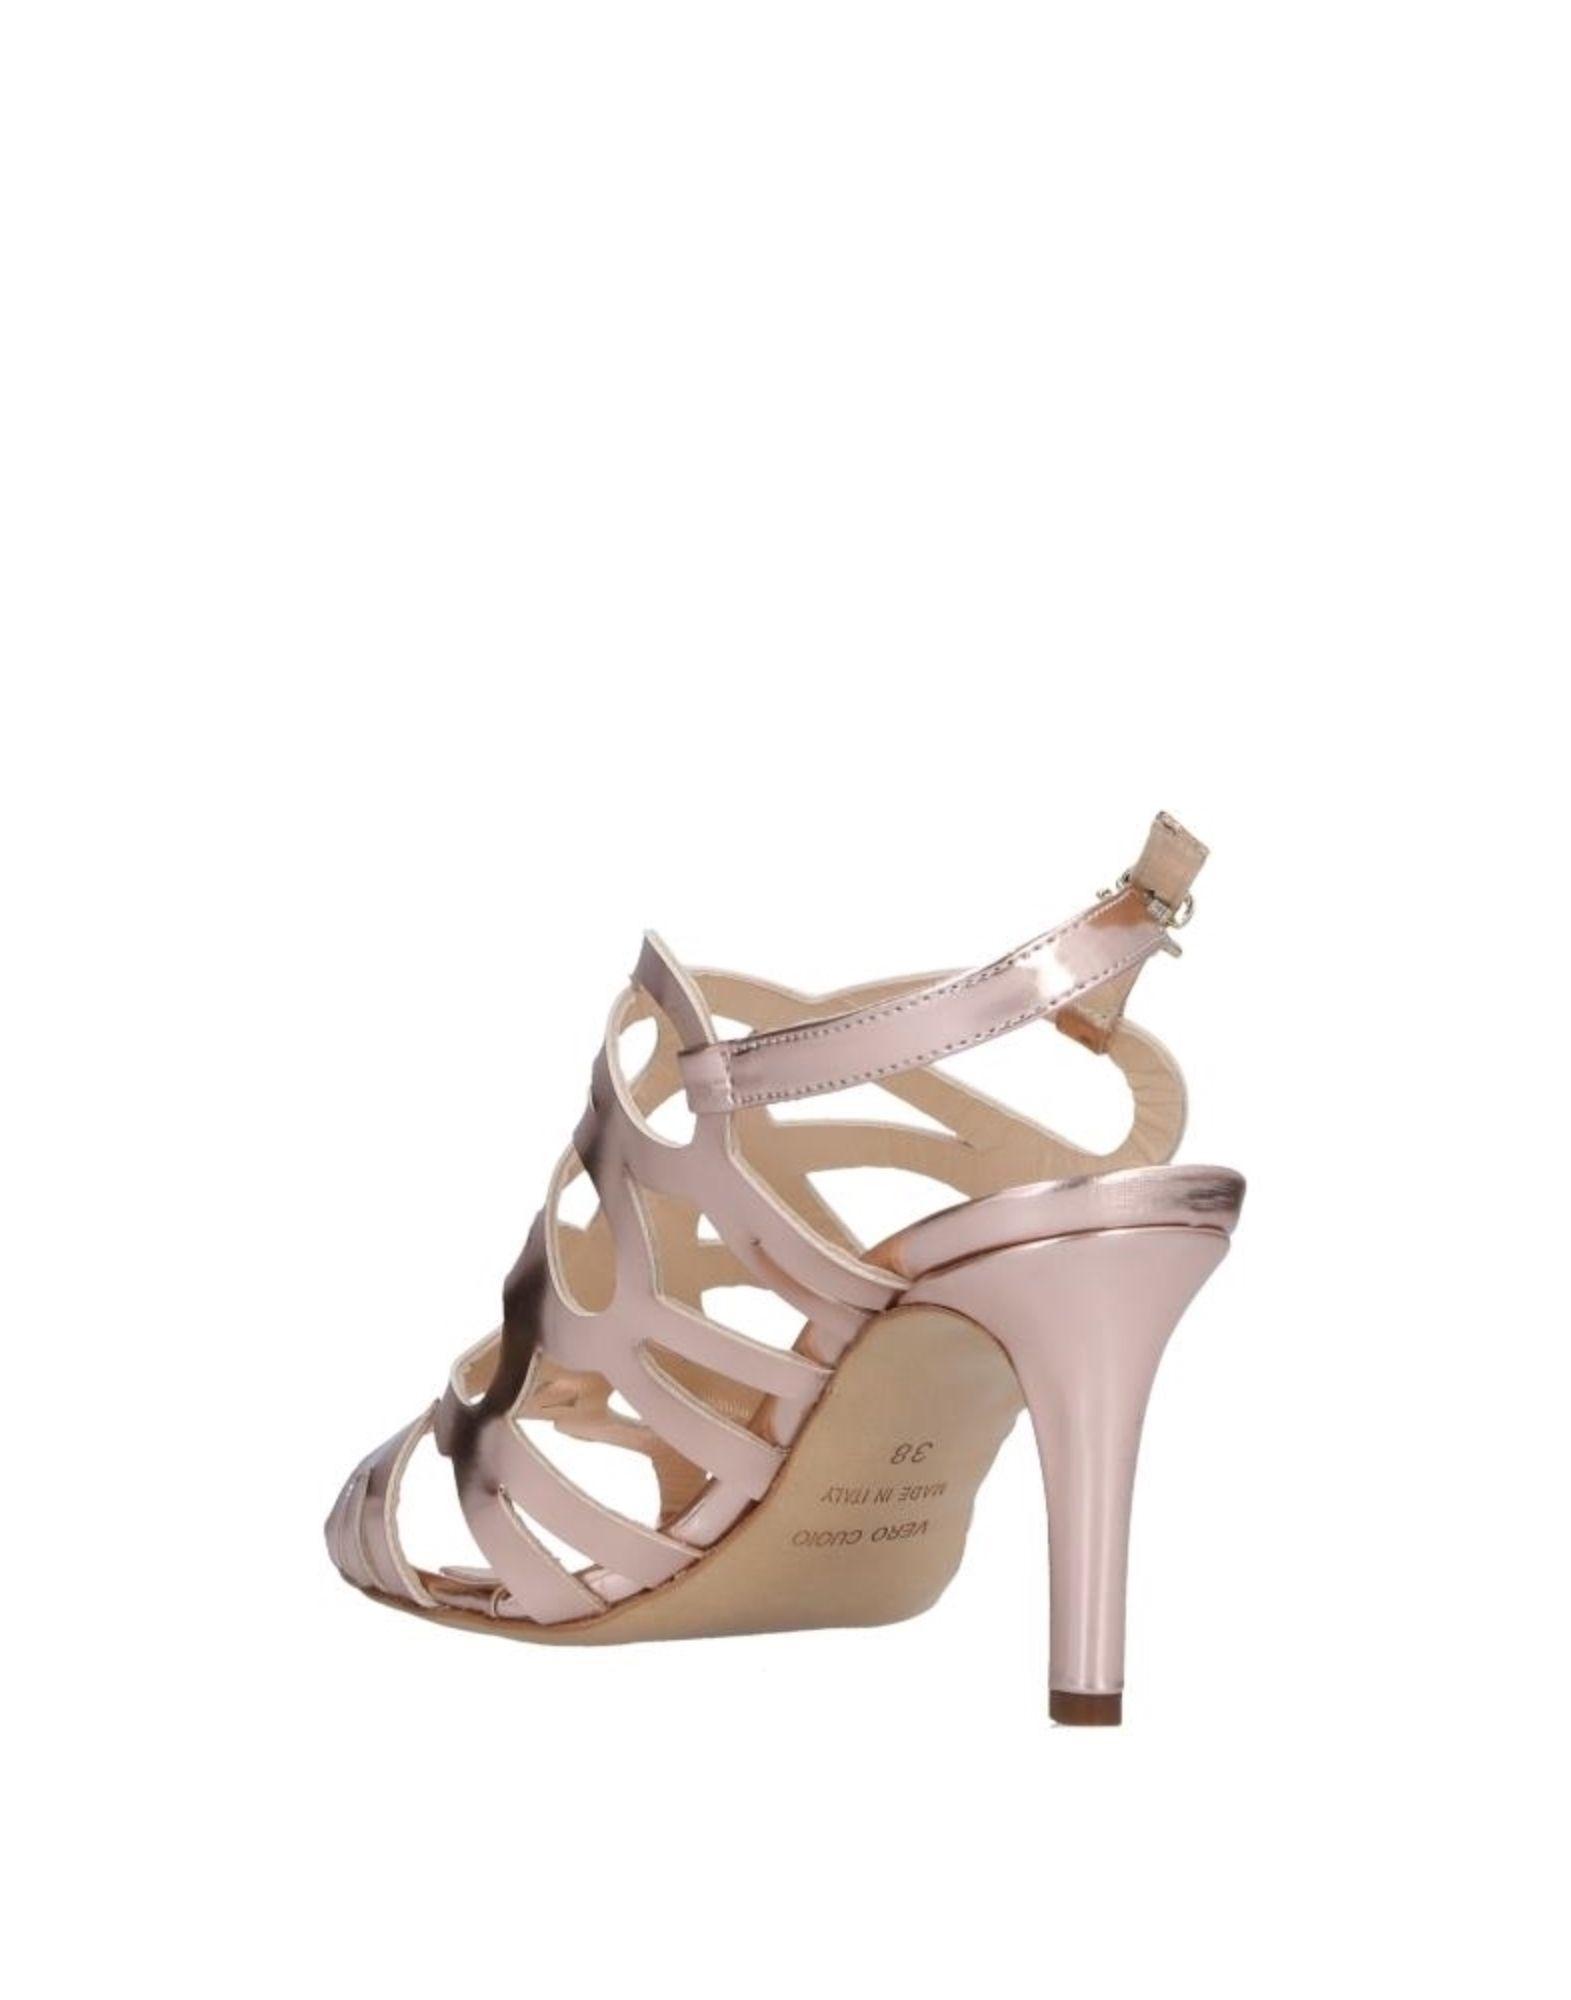 Daniela 11536466OH Mori Milano Sandalen Damen  11536466OH Daniela Gute Qualität beliebte Schuhe 37d955